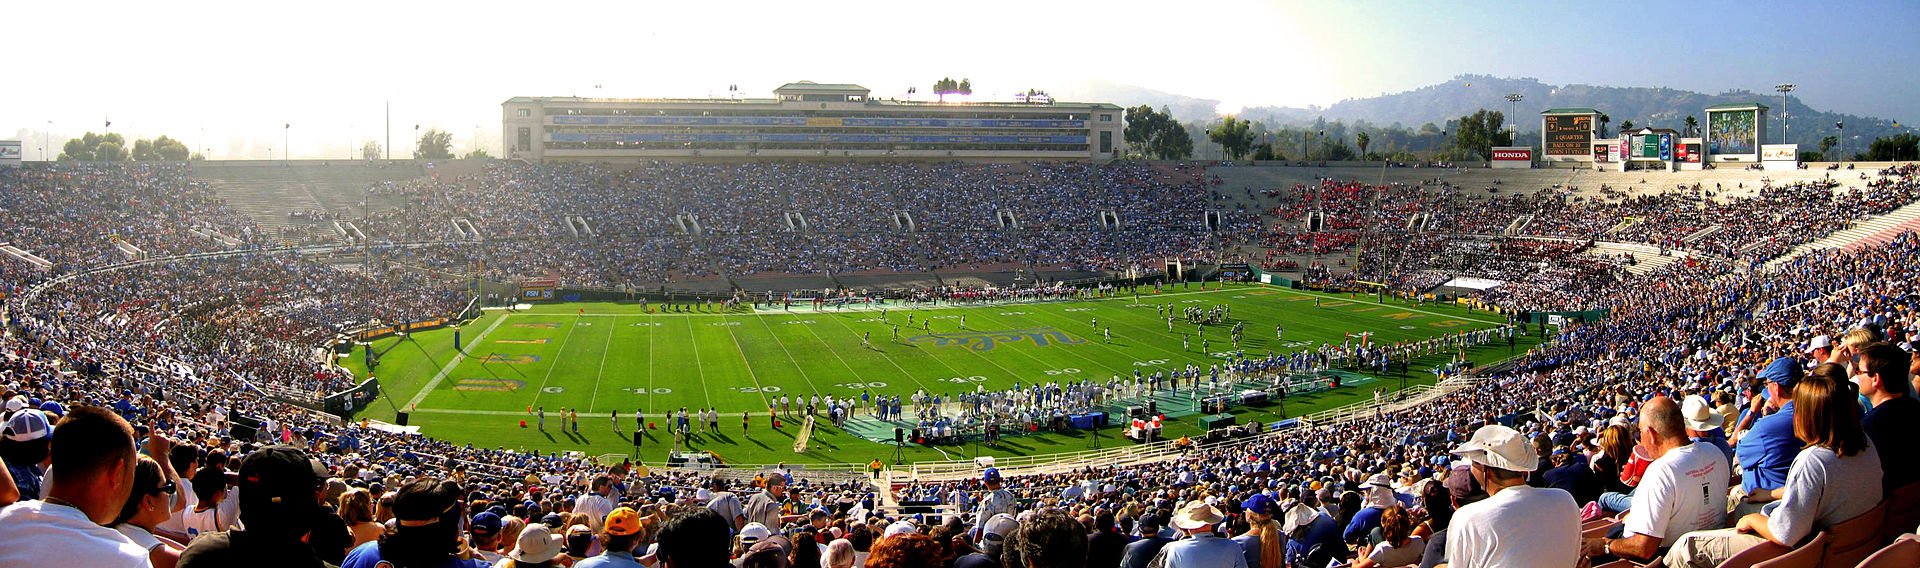 Rose Bowl, panorama.jpg